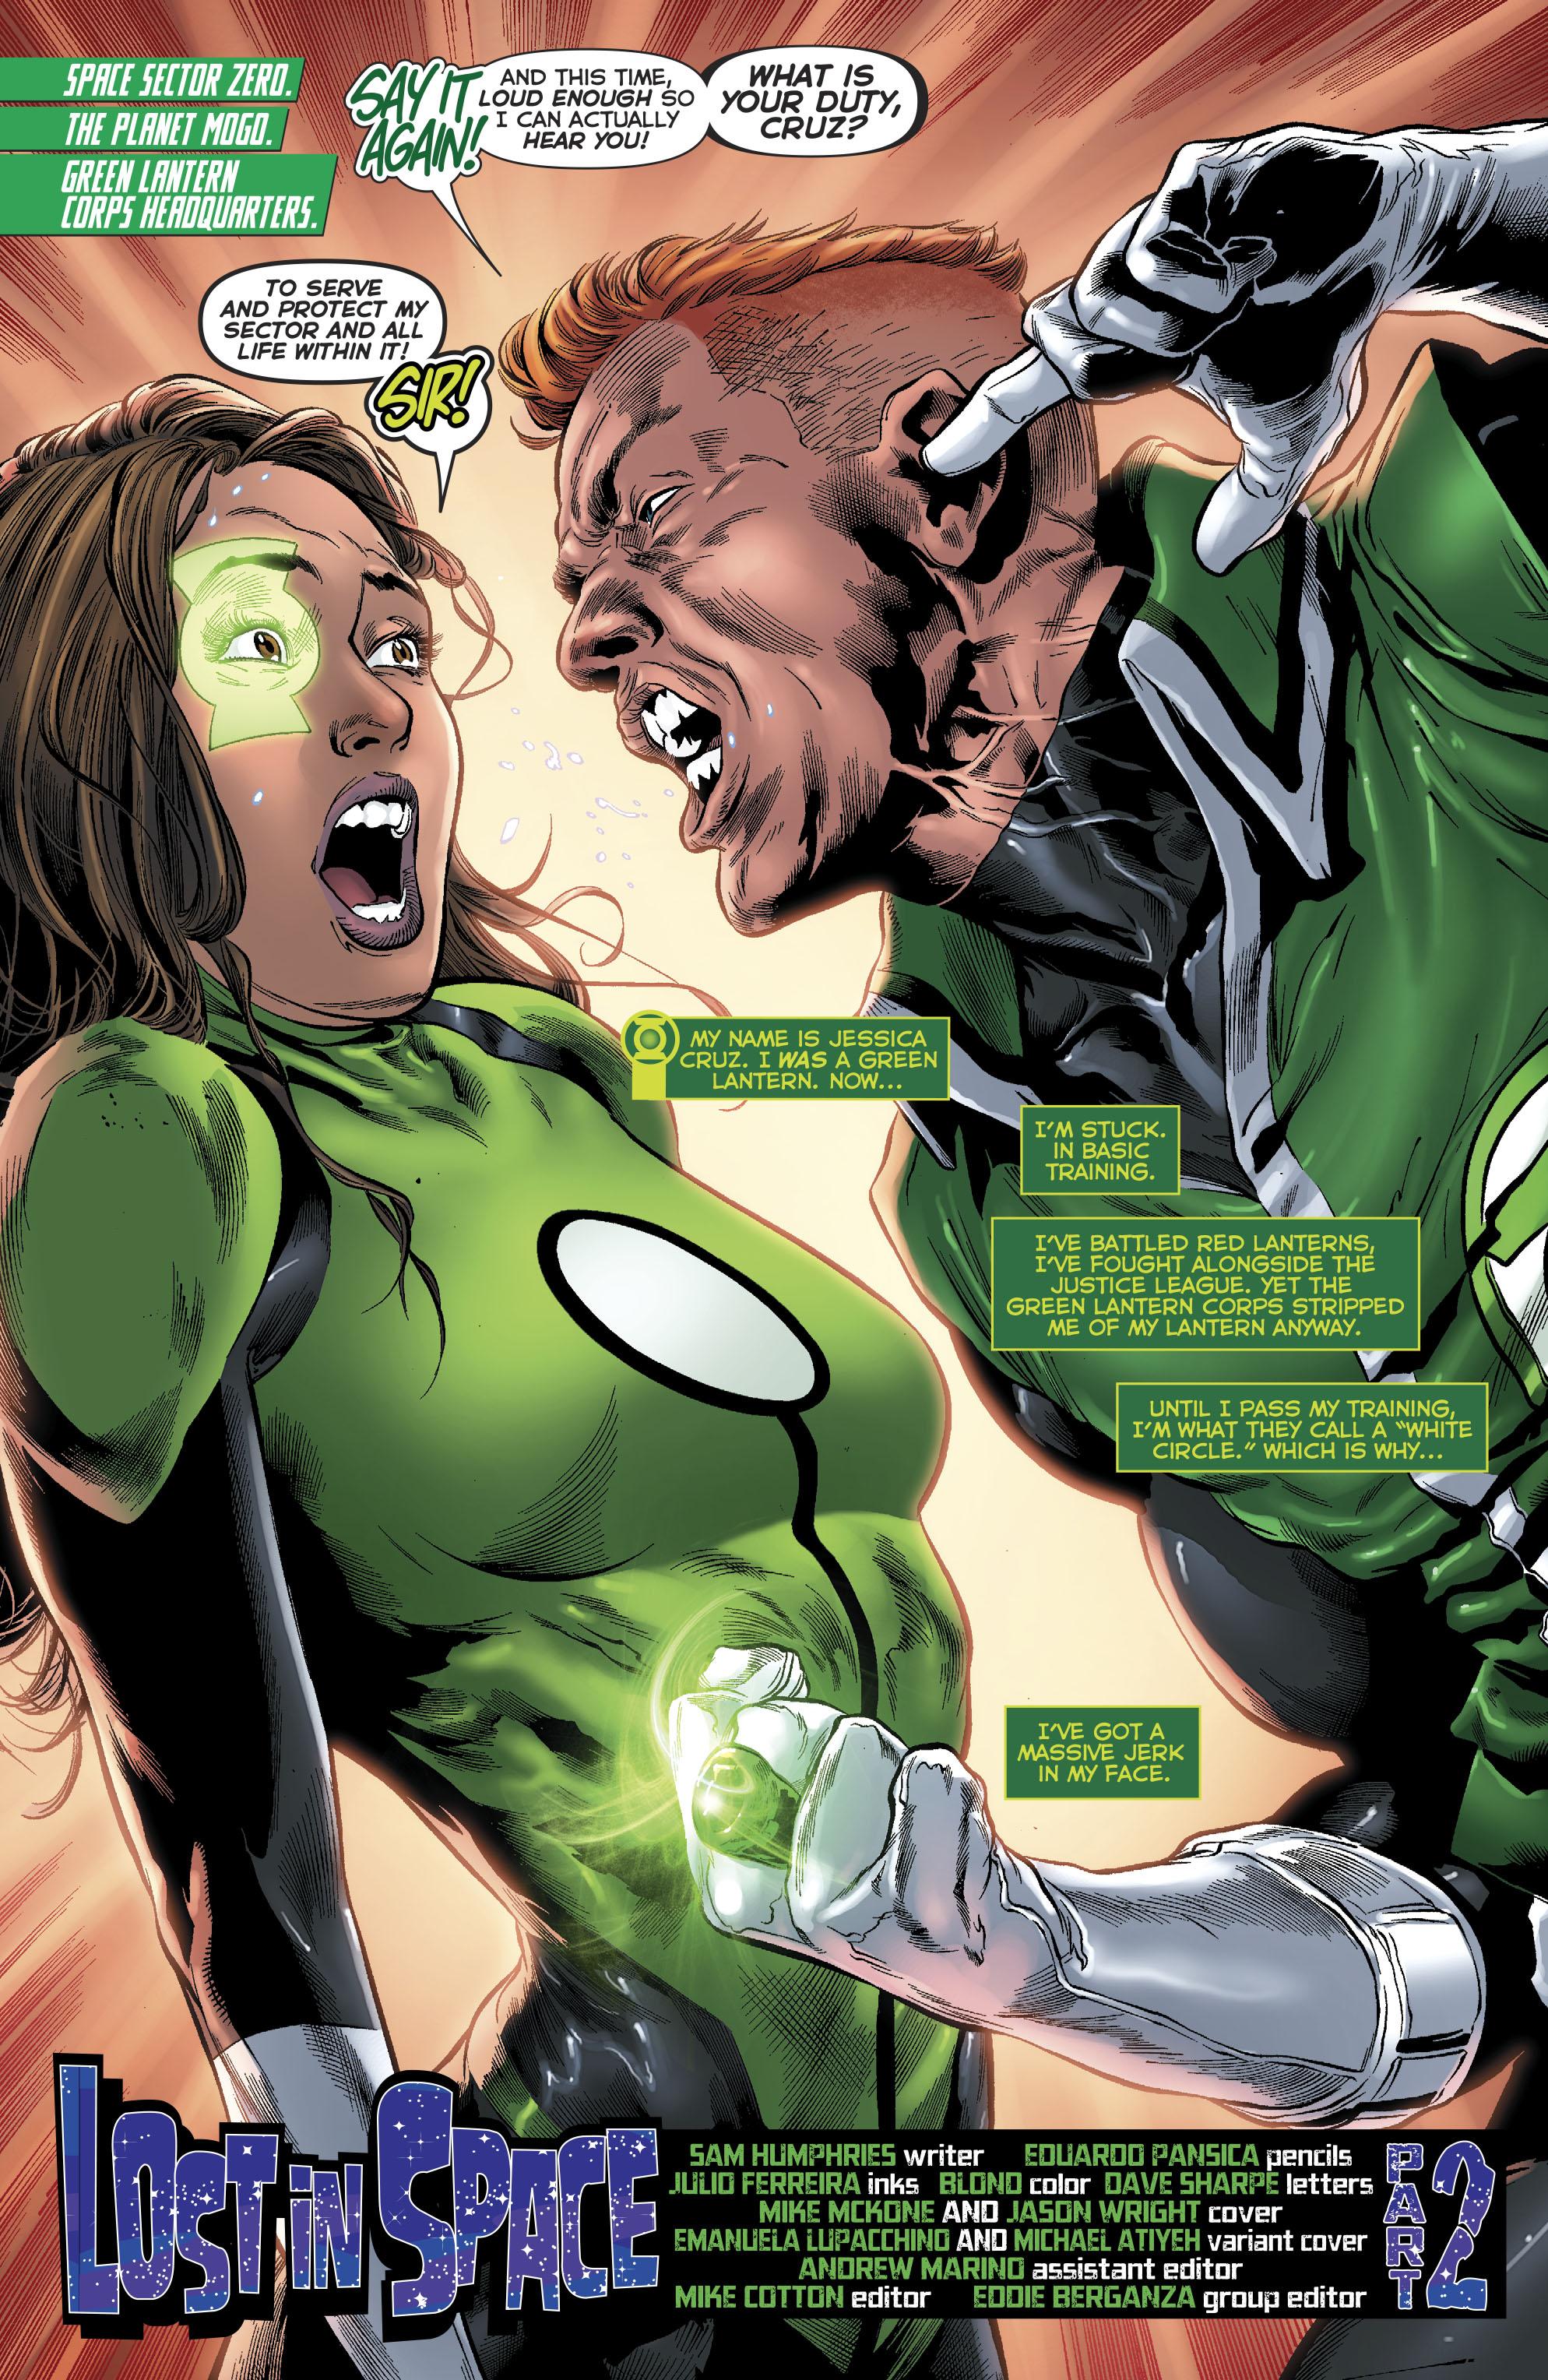 Read online Green Lanterns comic -  Issue #23 - 4